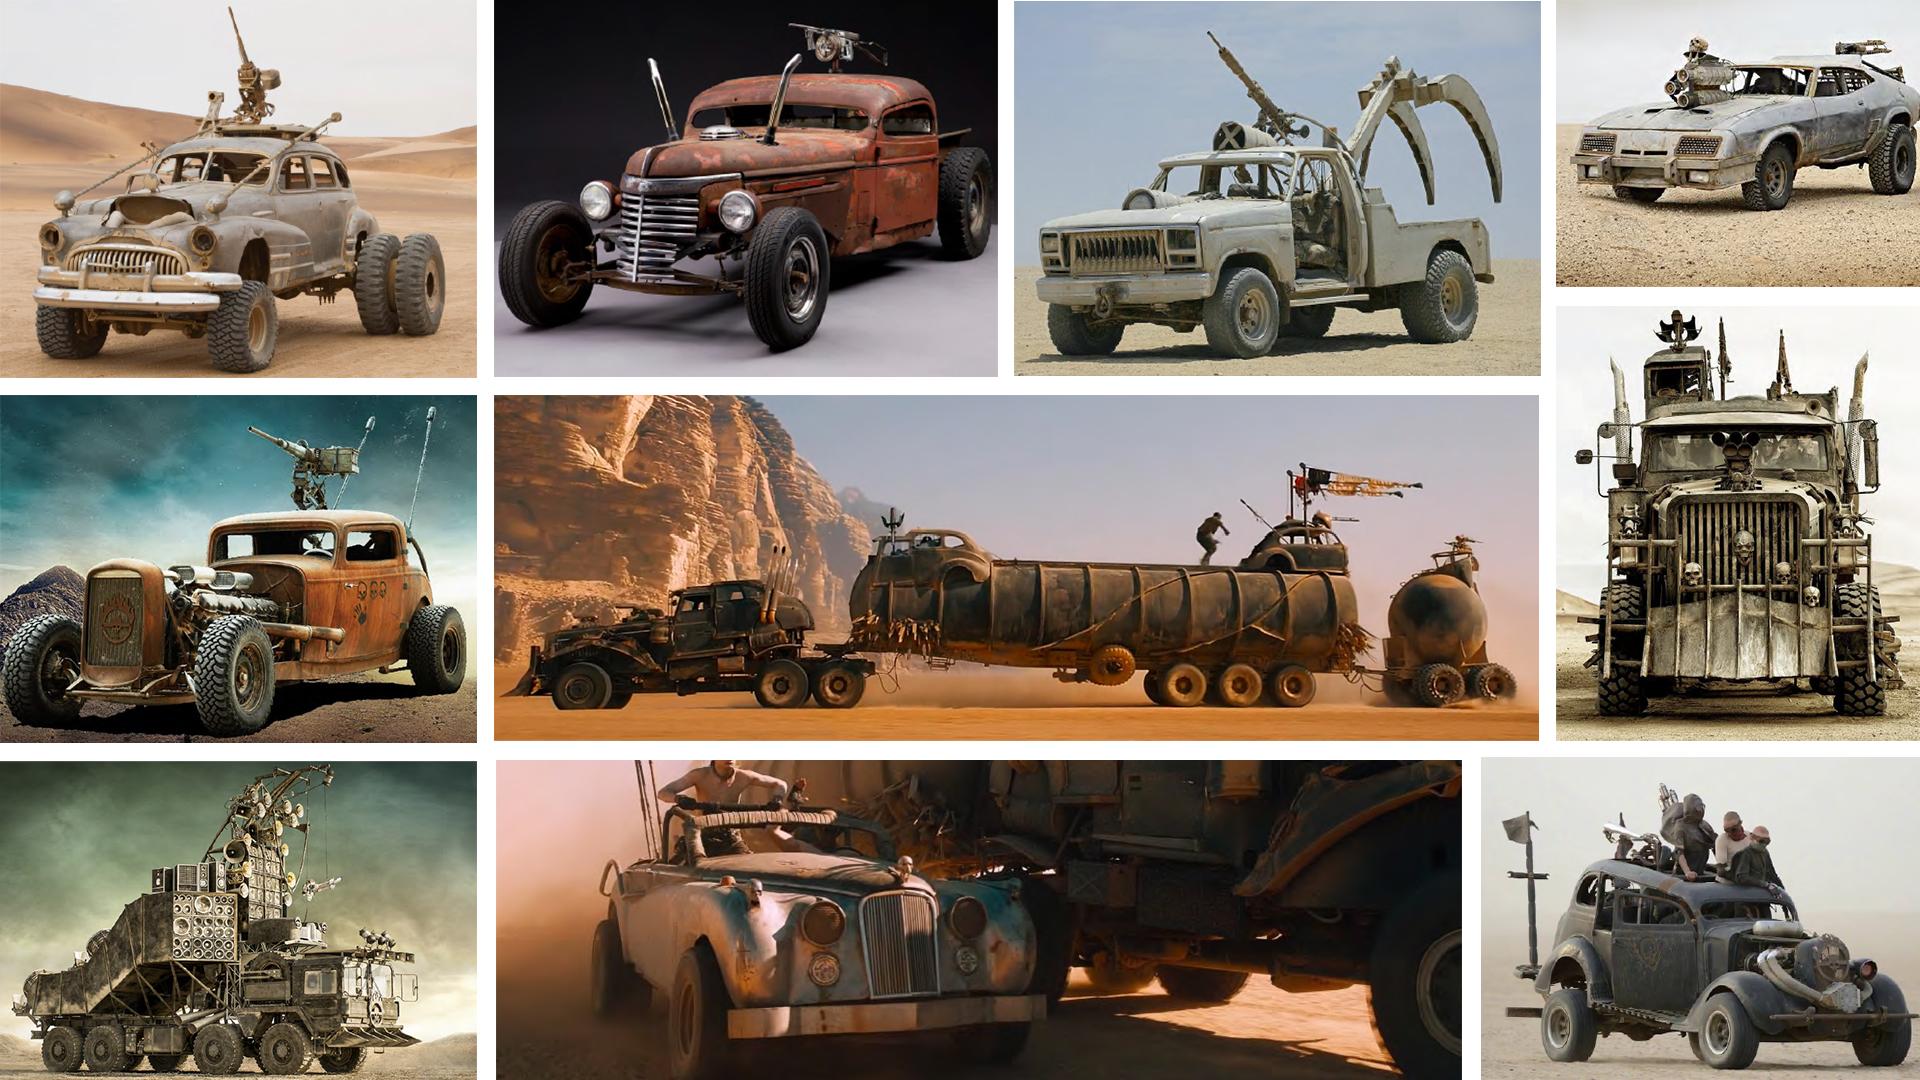 Post-Apocalyptic Carplay? 'Mad Max: Fury Road' Cars Hit the Block